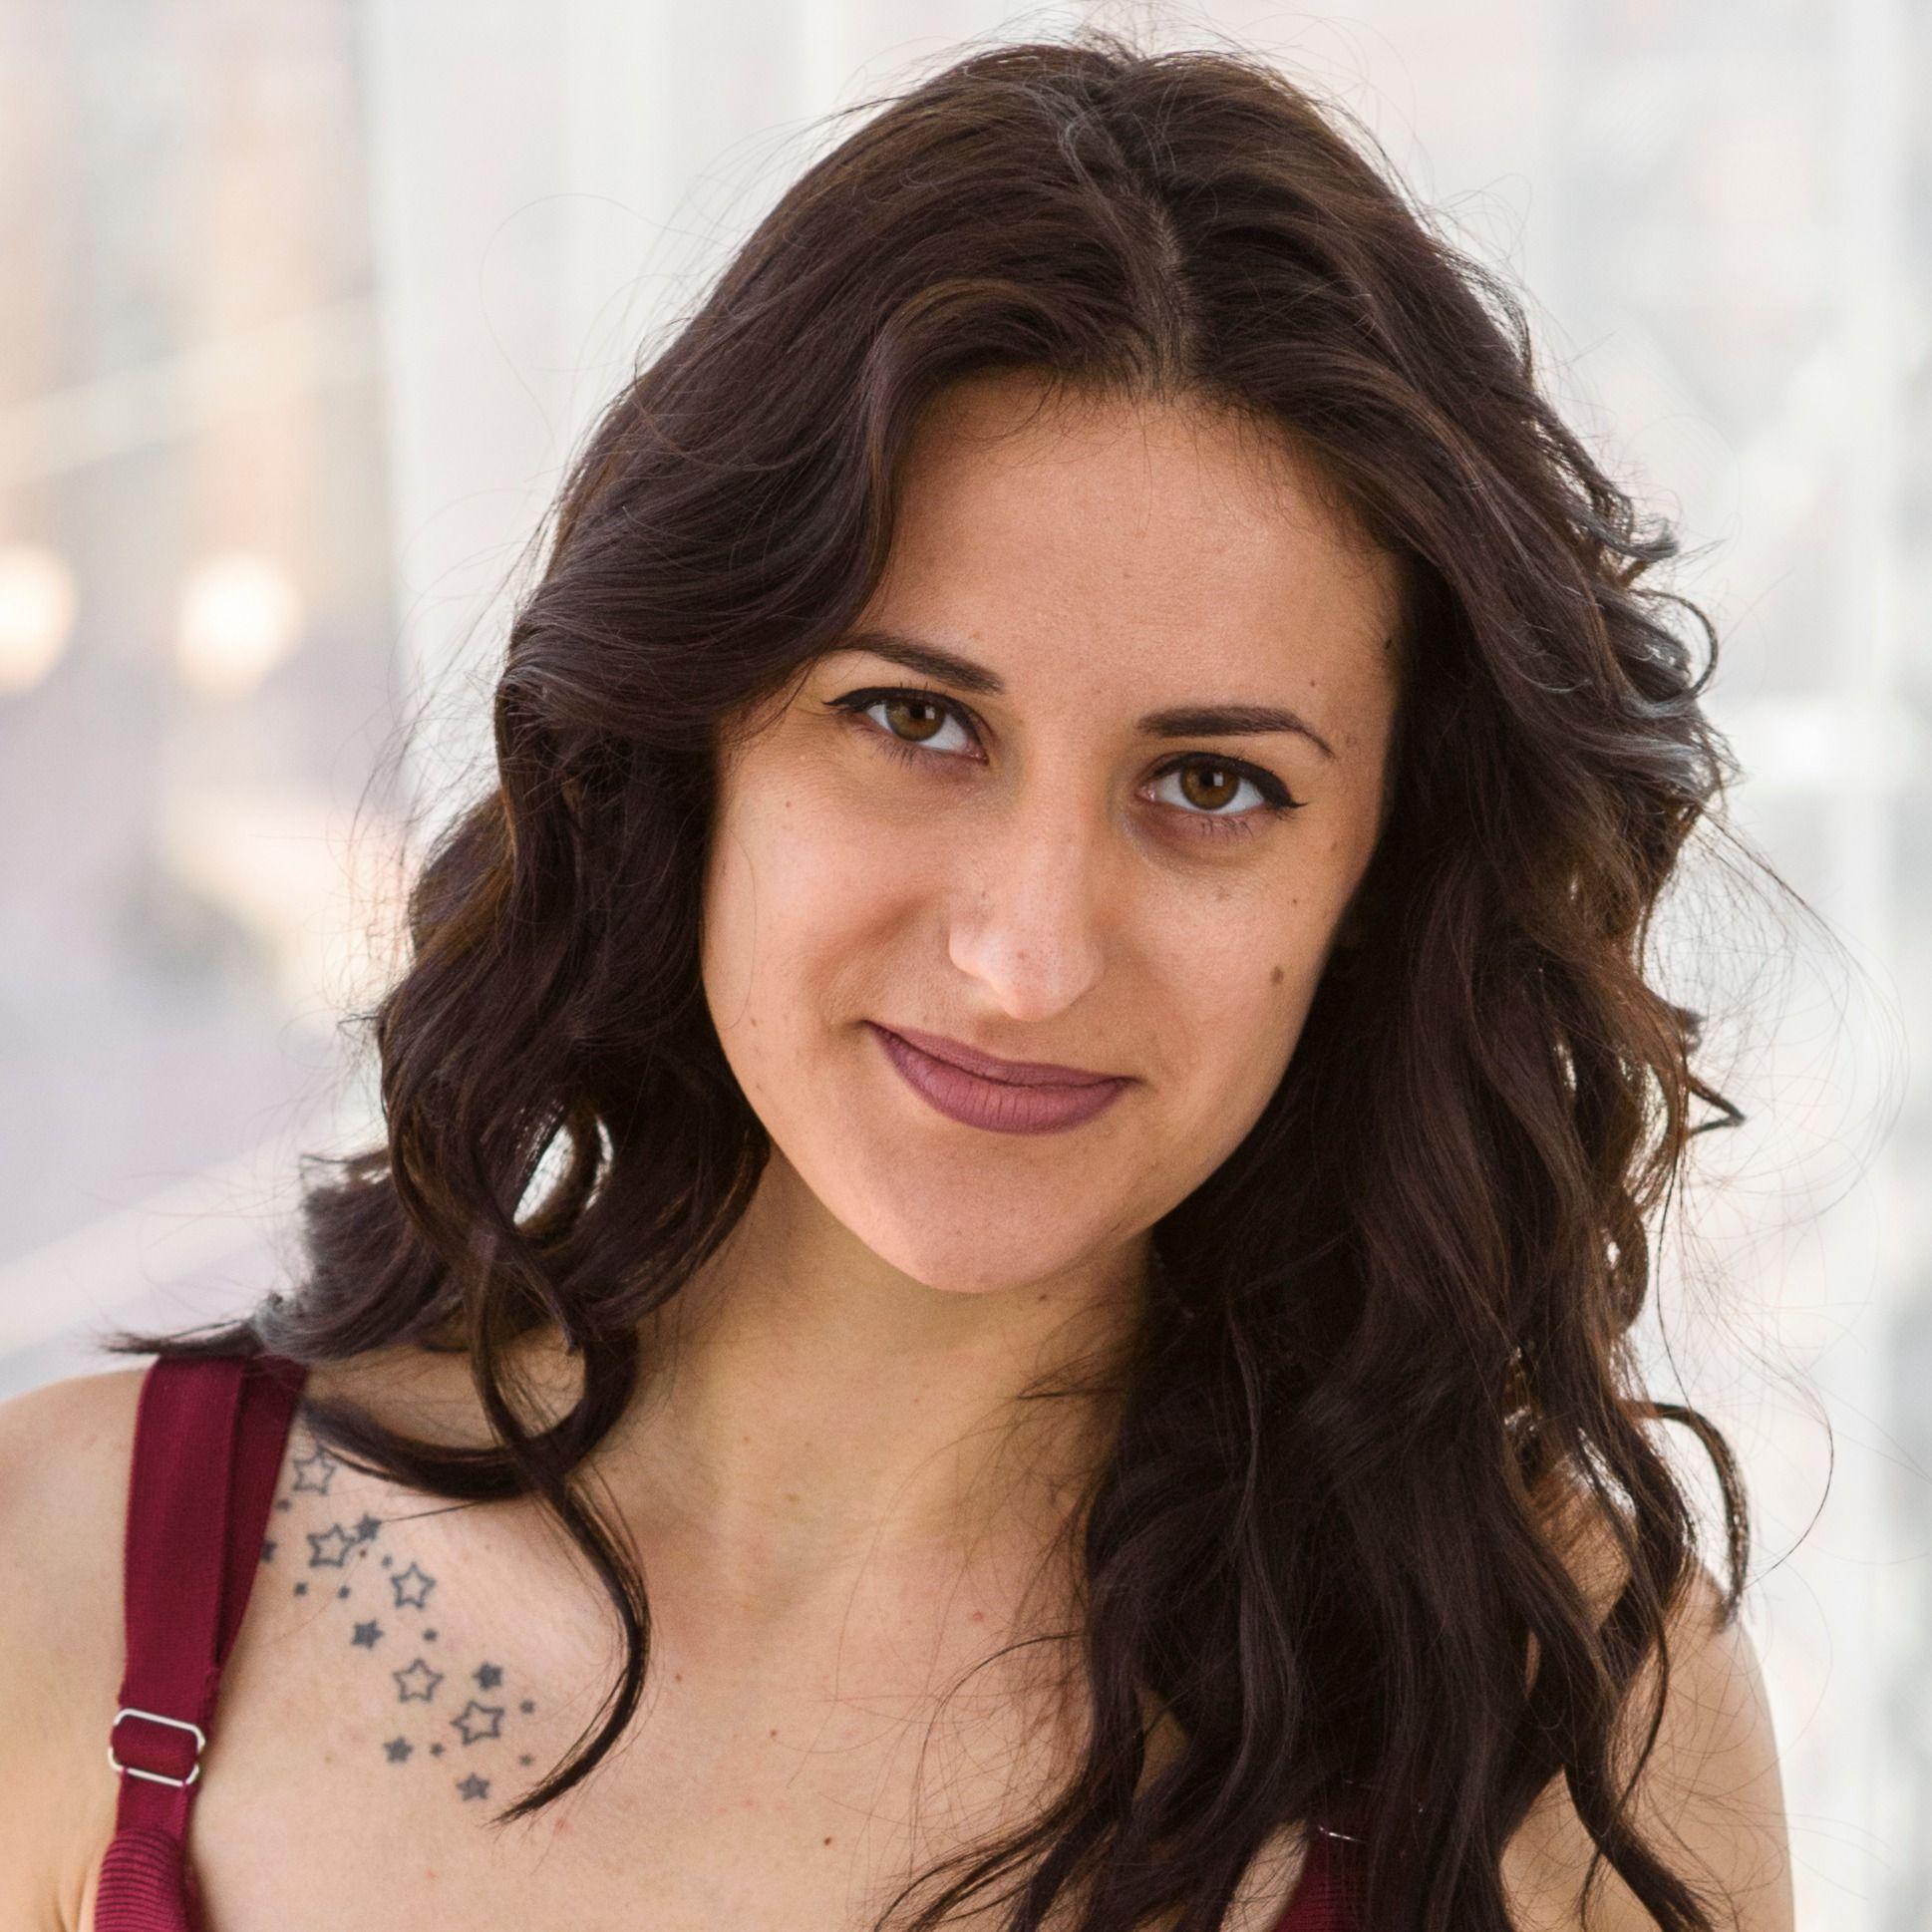 Alina Hacker Noon profile picture